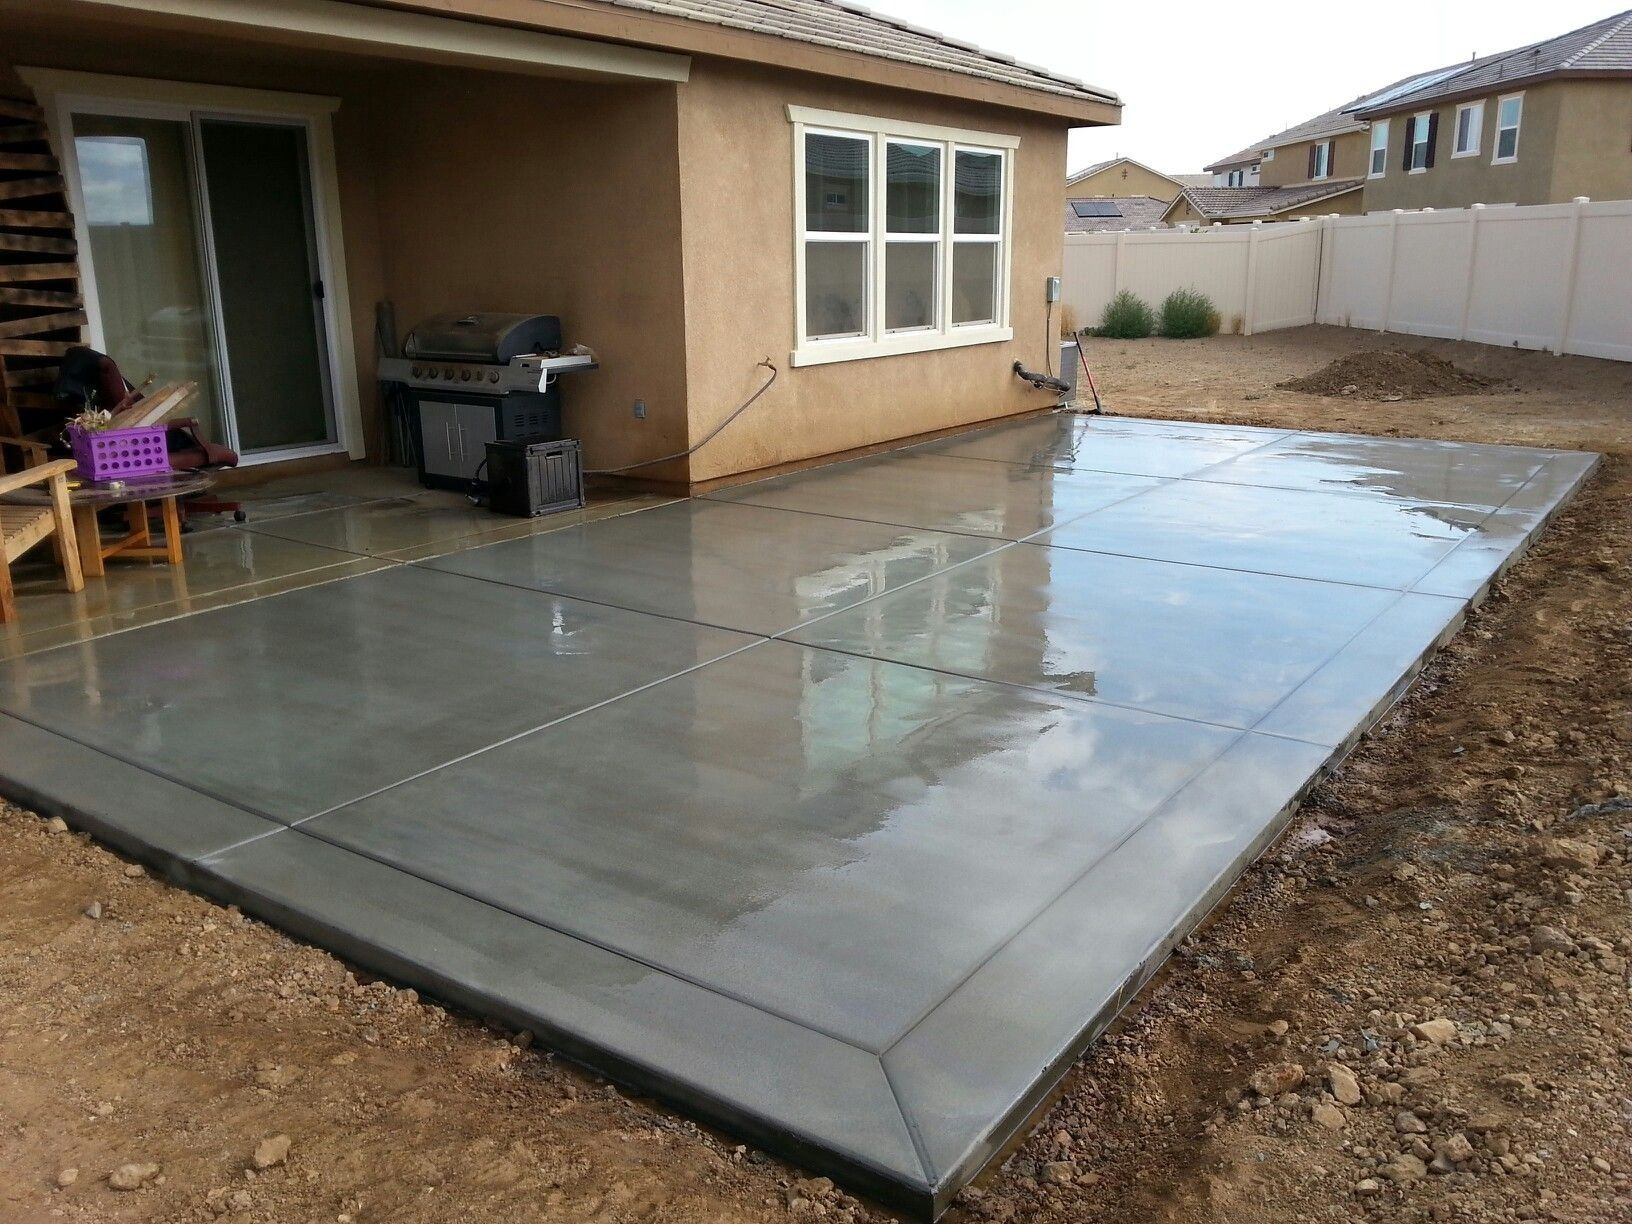 Backyard Concrete Slab Paver Patio Adorable Concrete Slabs Patio